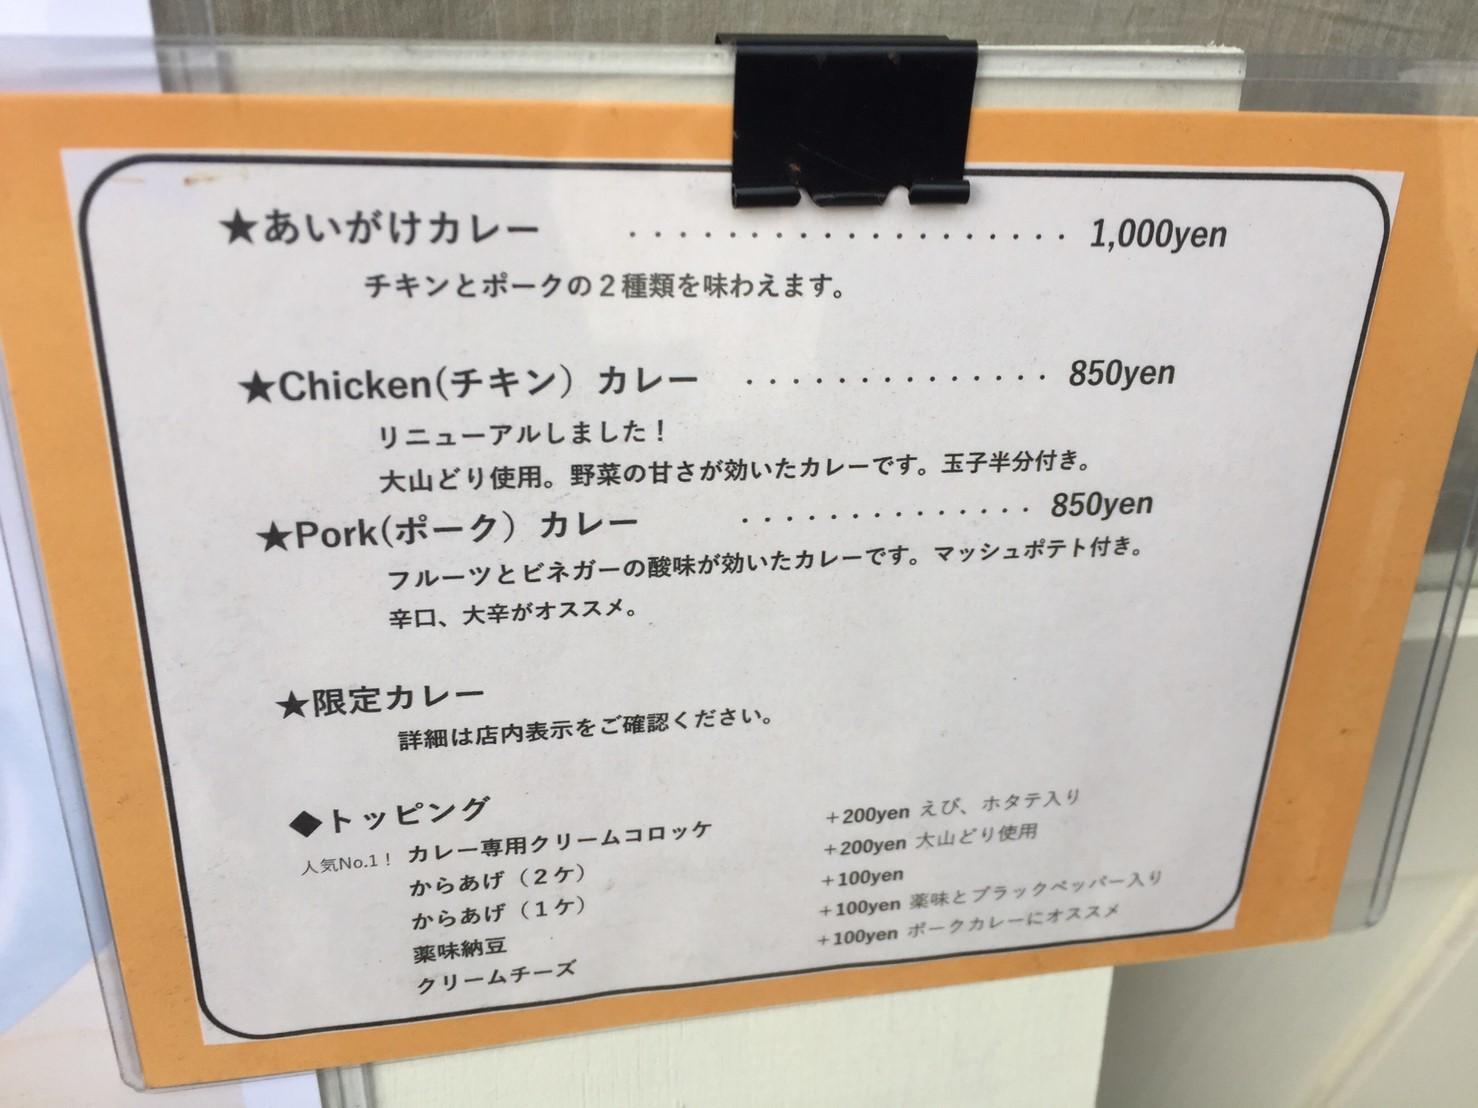 PARAKEET 限定カレー (金沢カレー風 ポークカツカレー)_e0115904_12380763.jpg